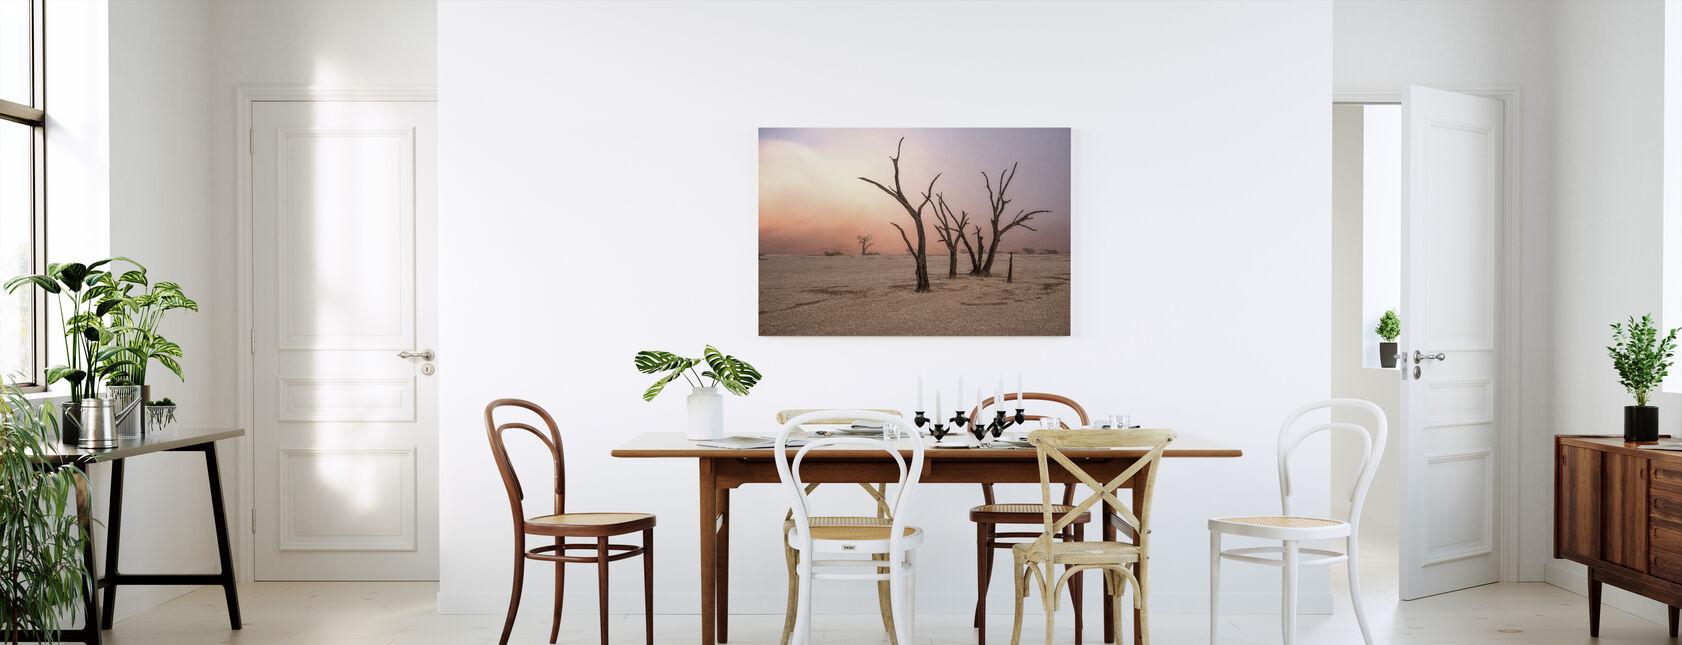 Sumu Deadvlei - Canvastaulu - Keittiö